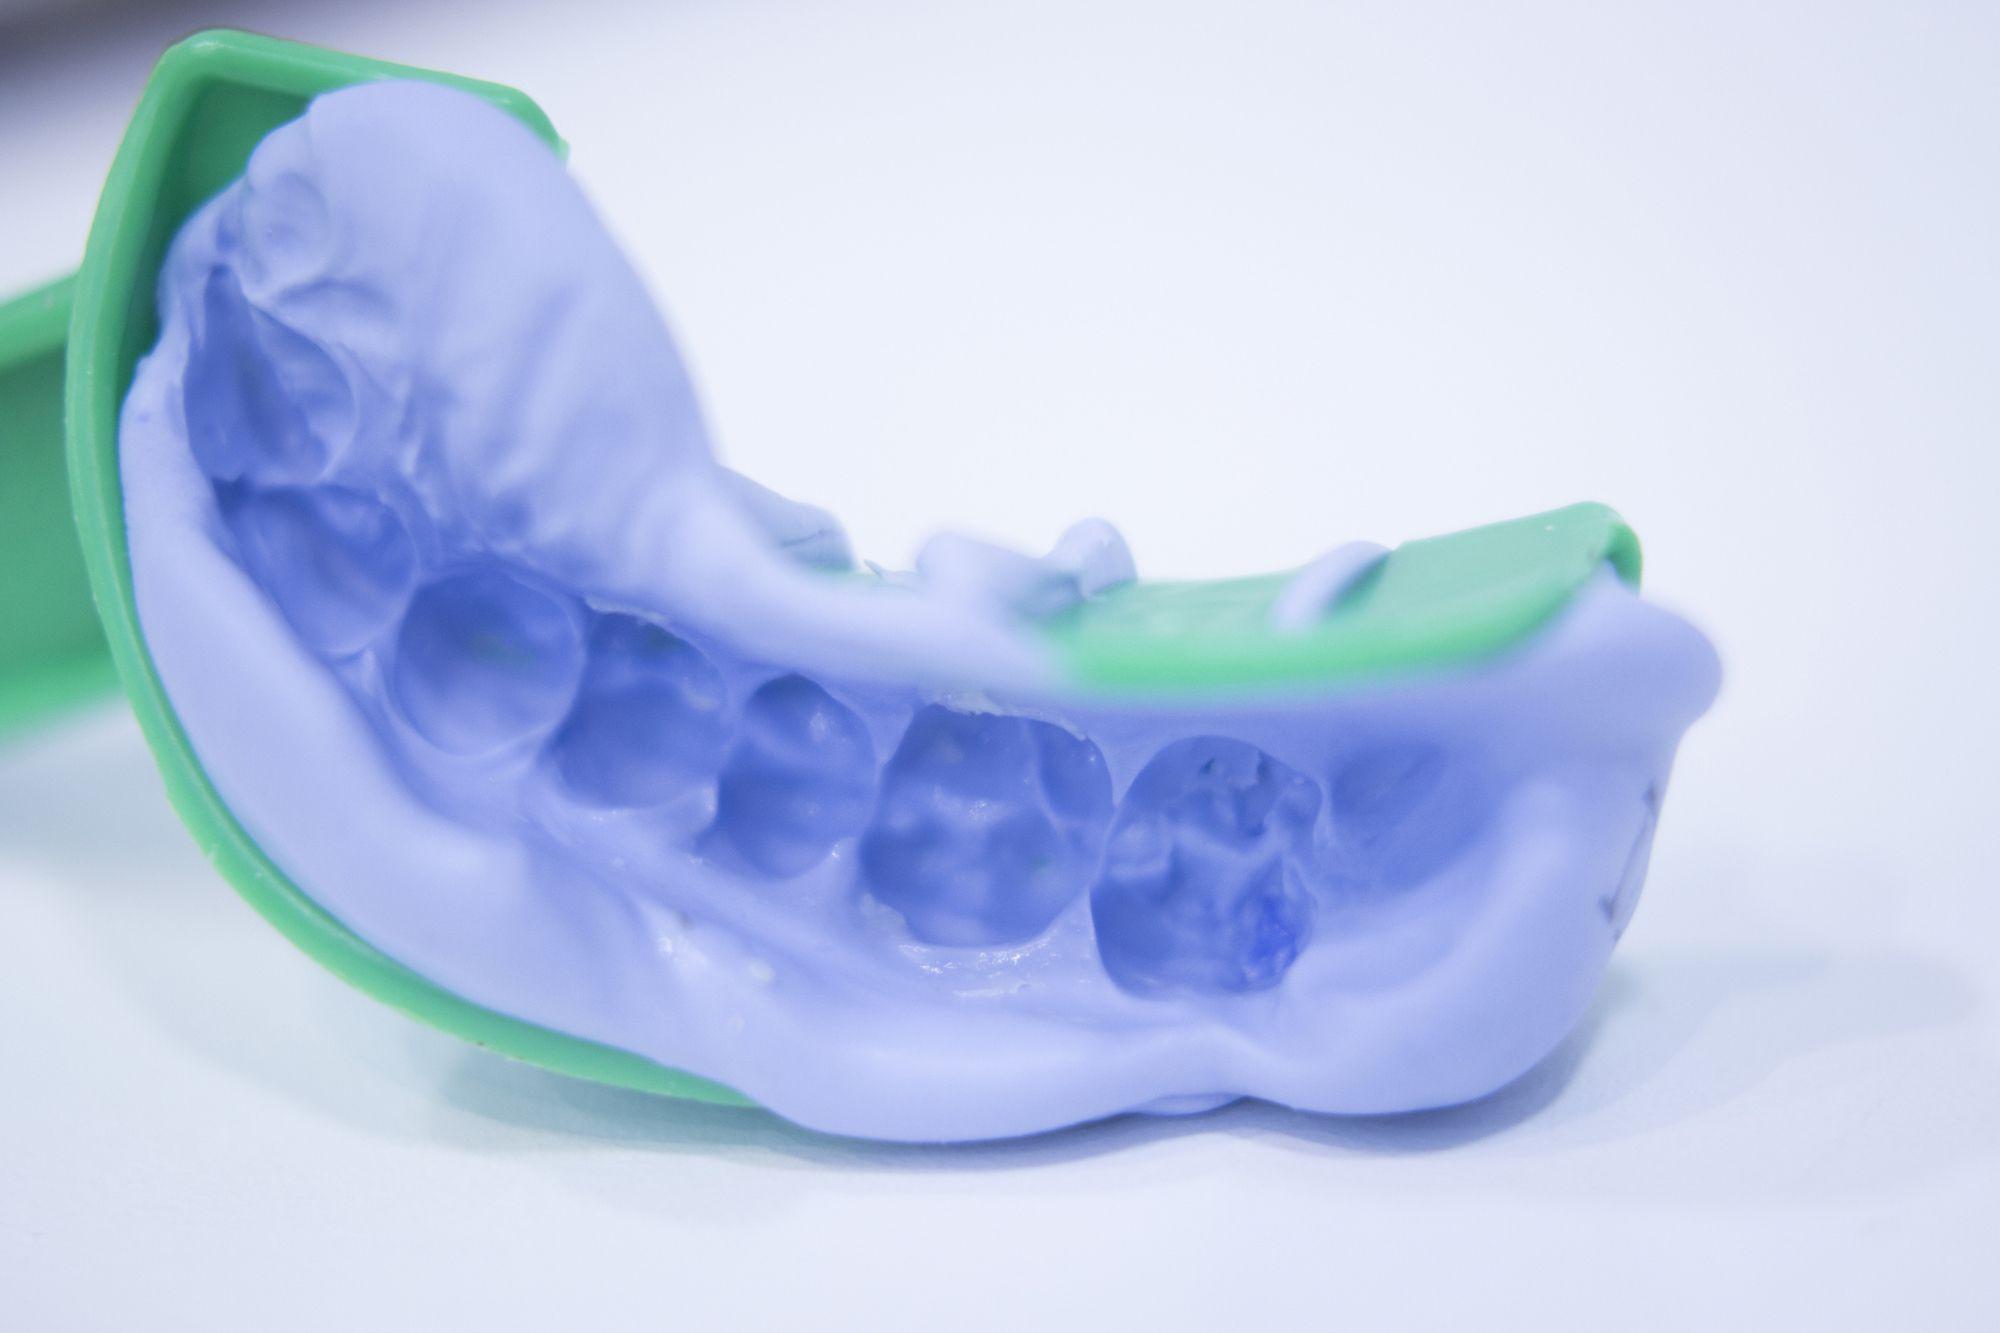 A dental tooth impression